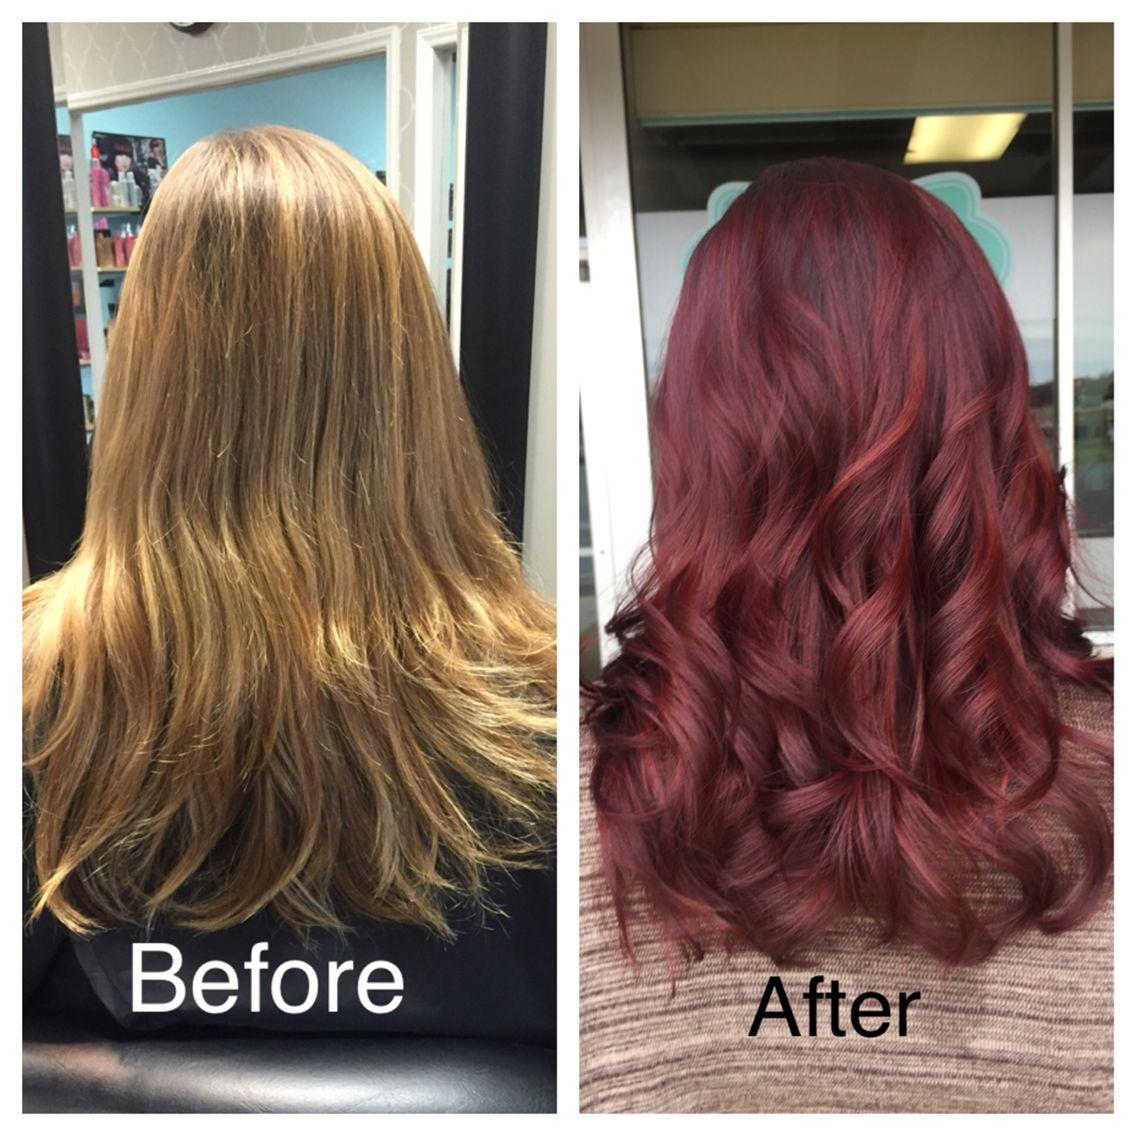 Hair Growth Shampoo And Conditioner Hair Burgundy Hair Red Hair Color